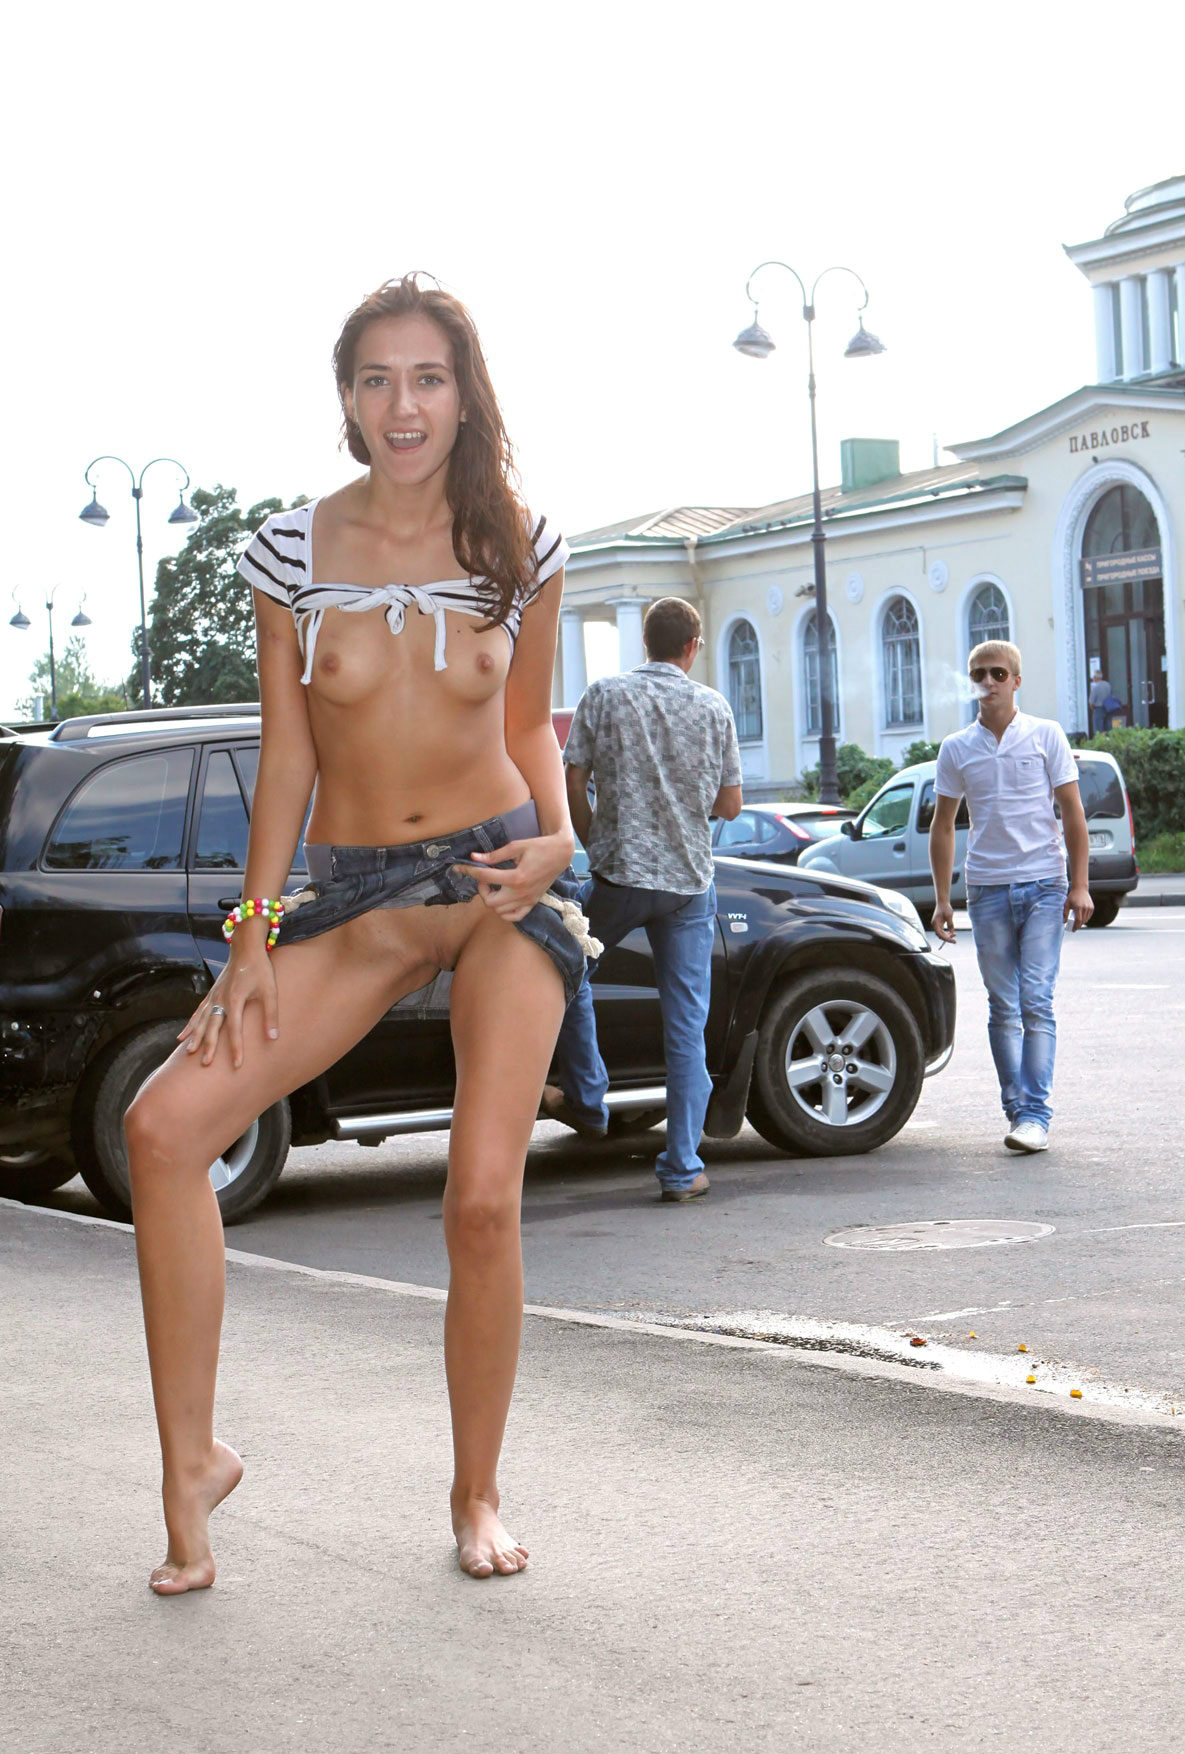 videos de prostitutas en la calle famosas prostitutas de lujo